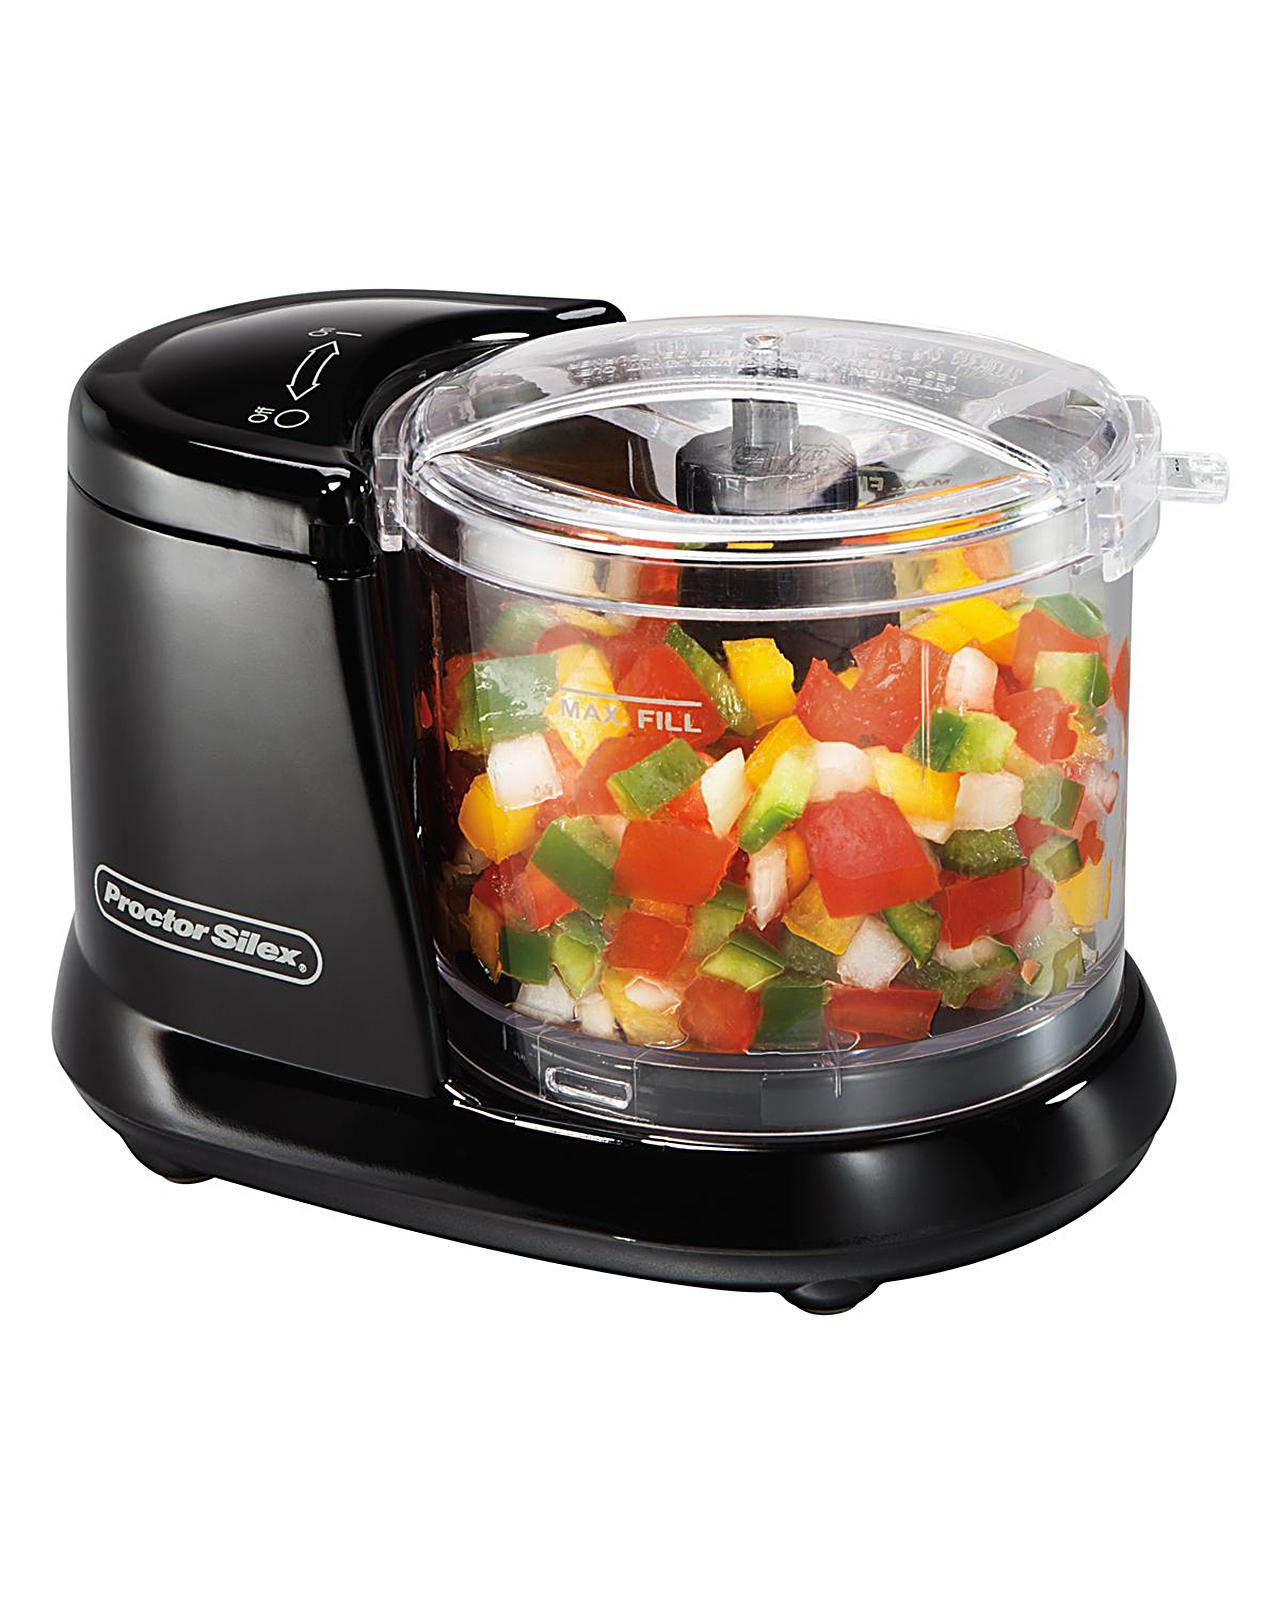 Proctor Silex 1.5 Cup Food Chopper - Appliances Small Kitchen Processors